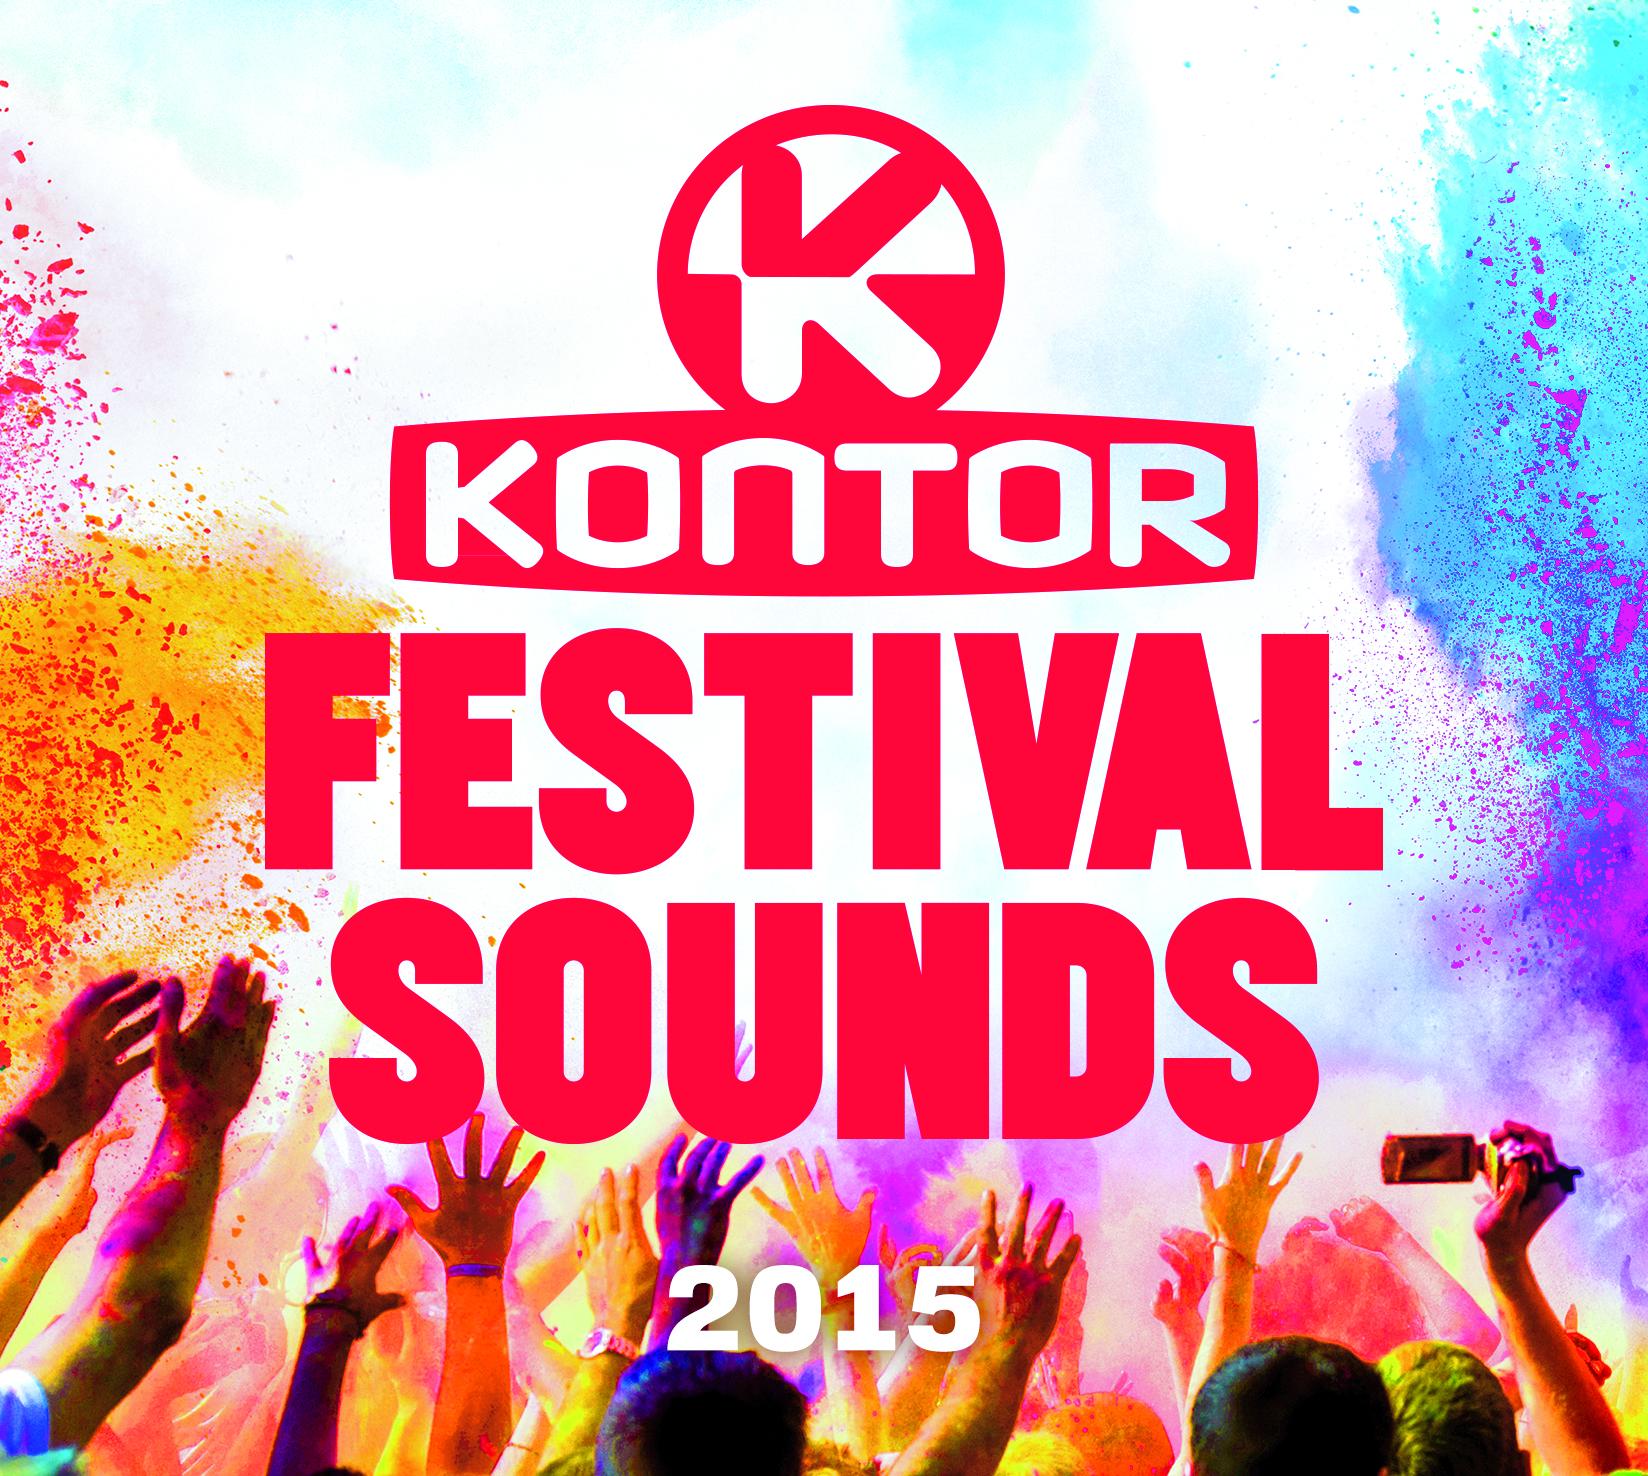 """Kontor Festival Sounds 2015"" blickt auf den Sommer zurück"